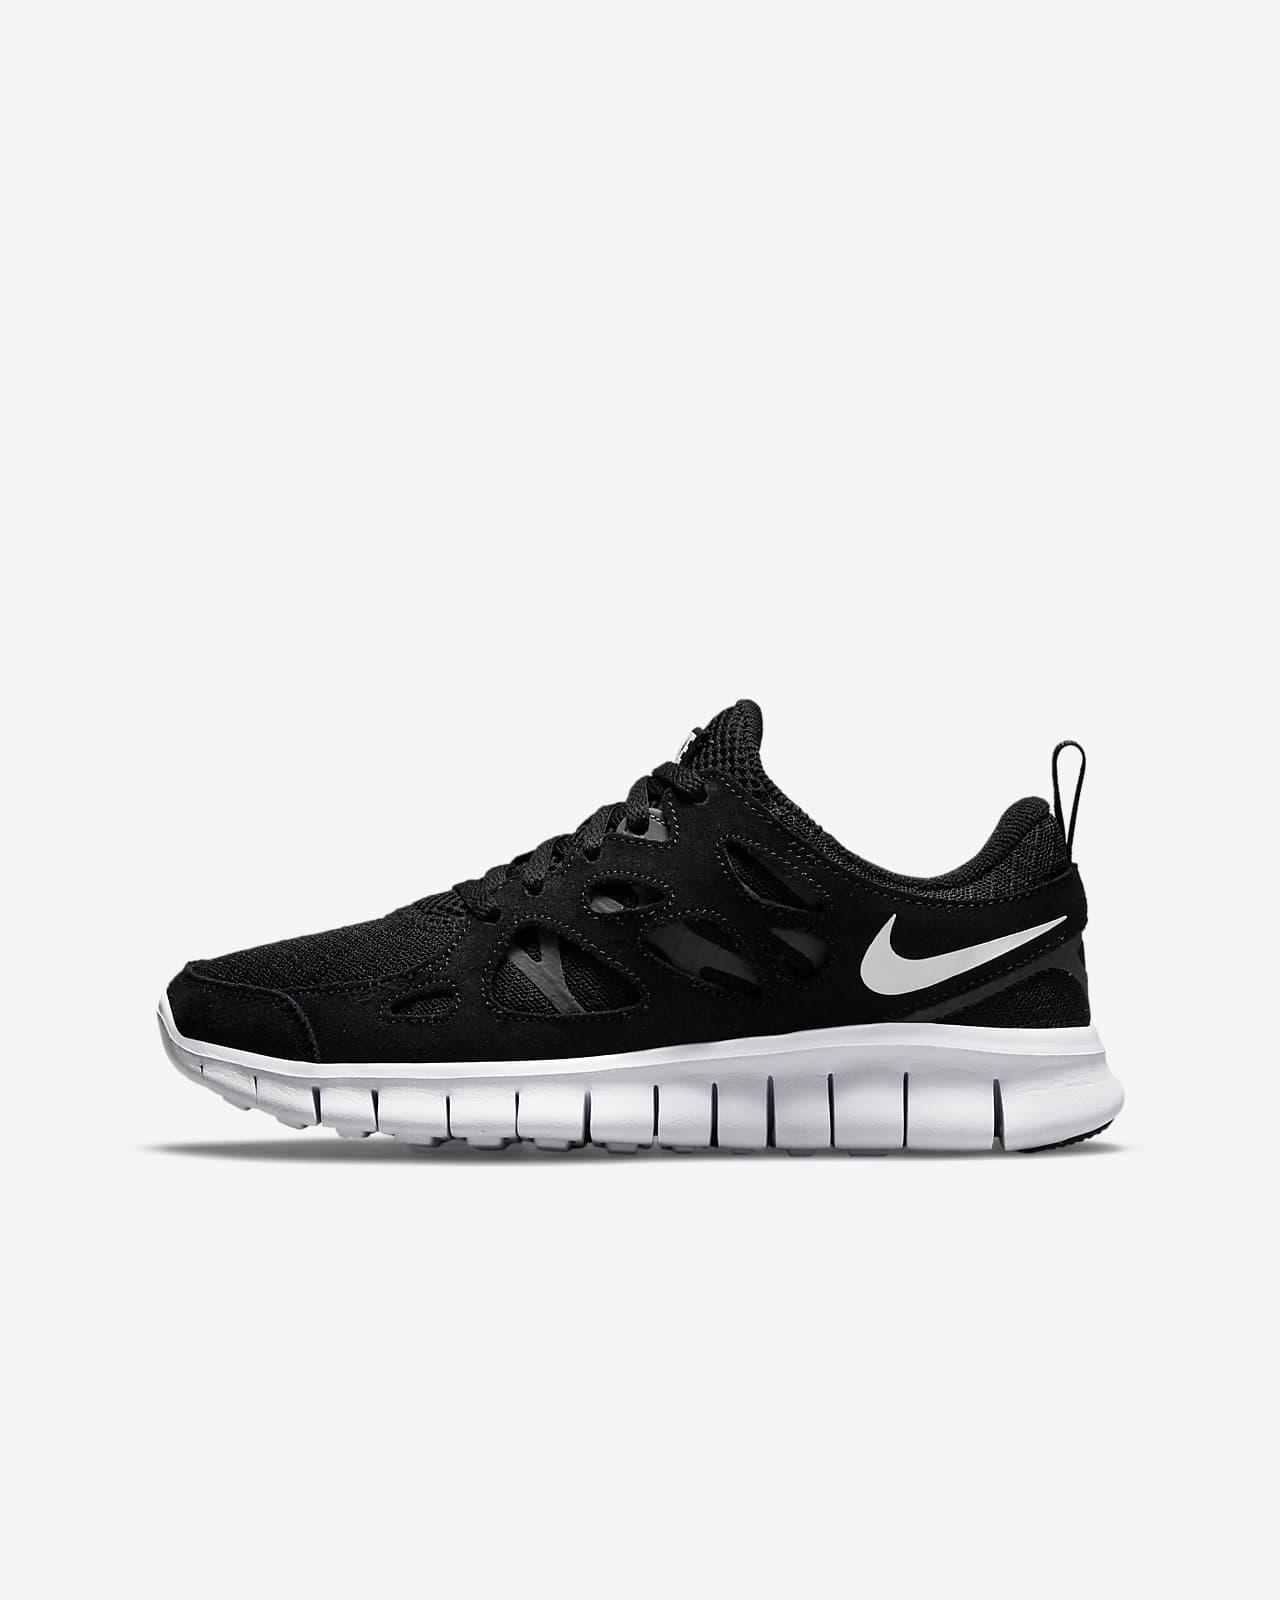 Sapatilhas Nike Free Run 2 Júnior